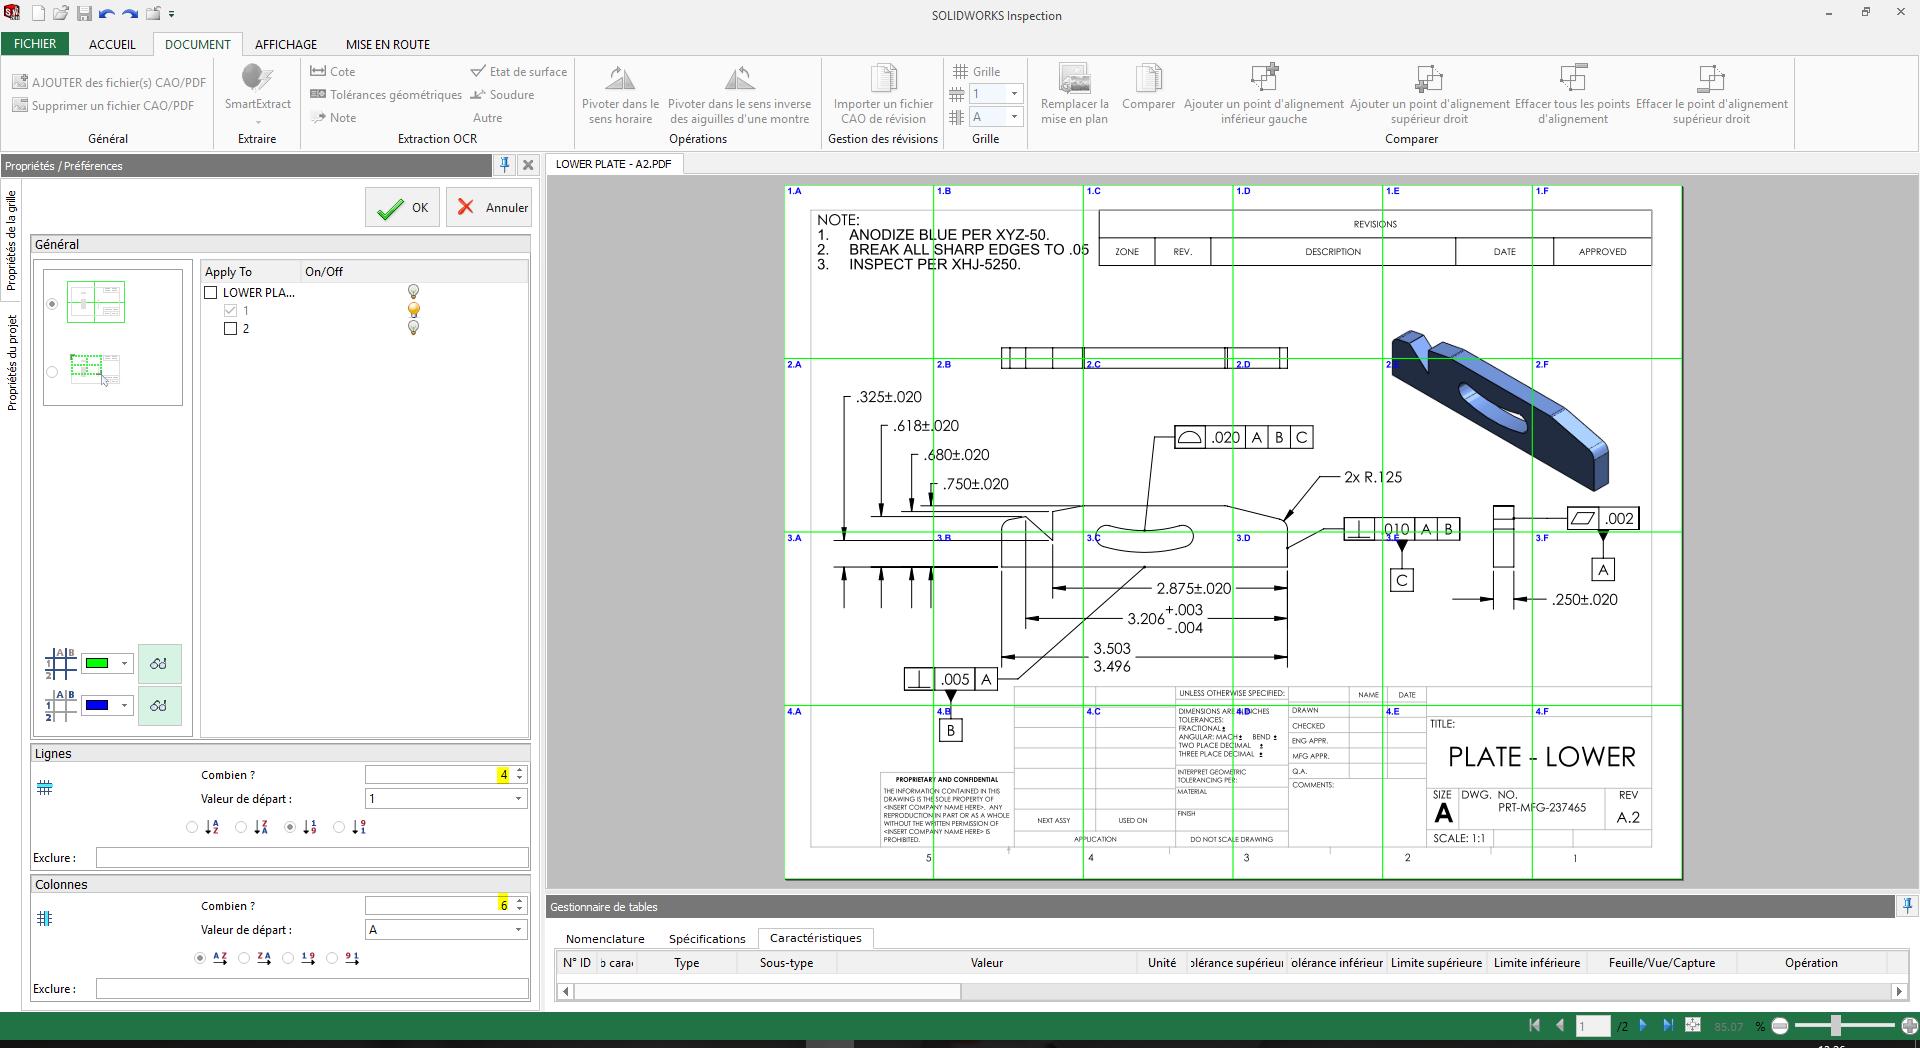 gérer la localisation dans solidworks inspection